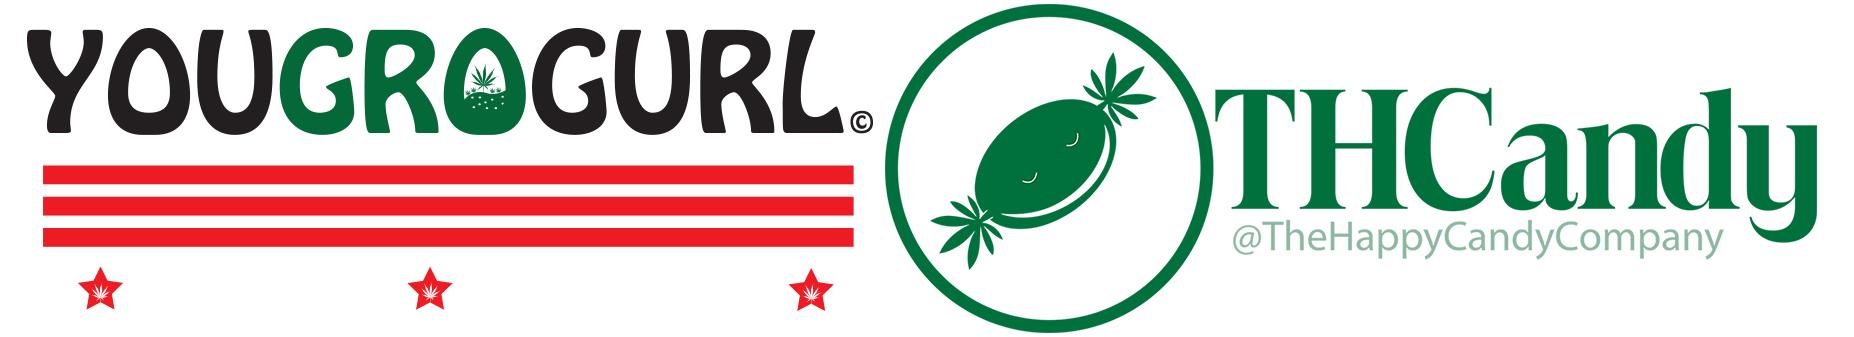 YouGroGurl Happy Candy Company Logo